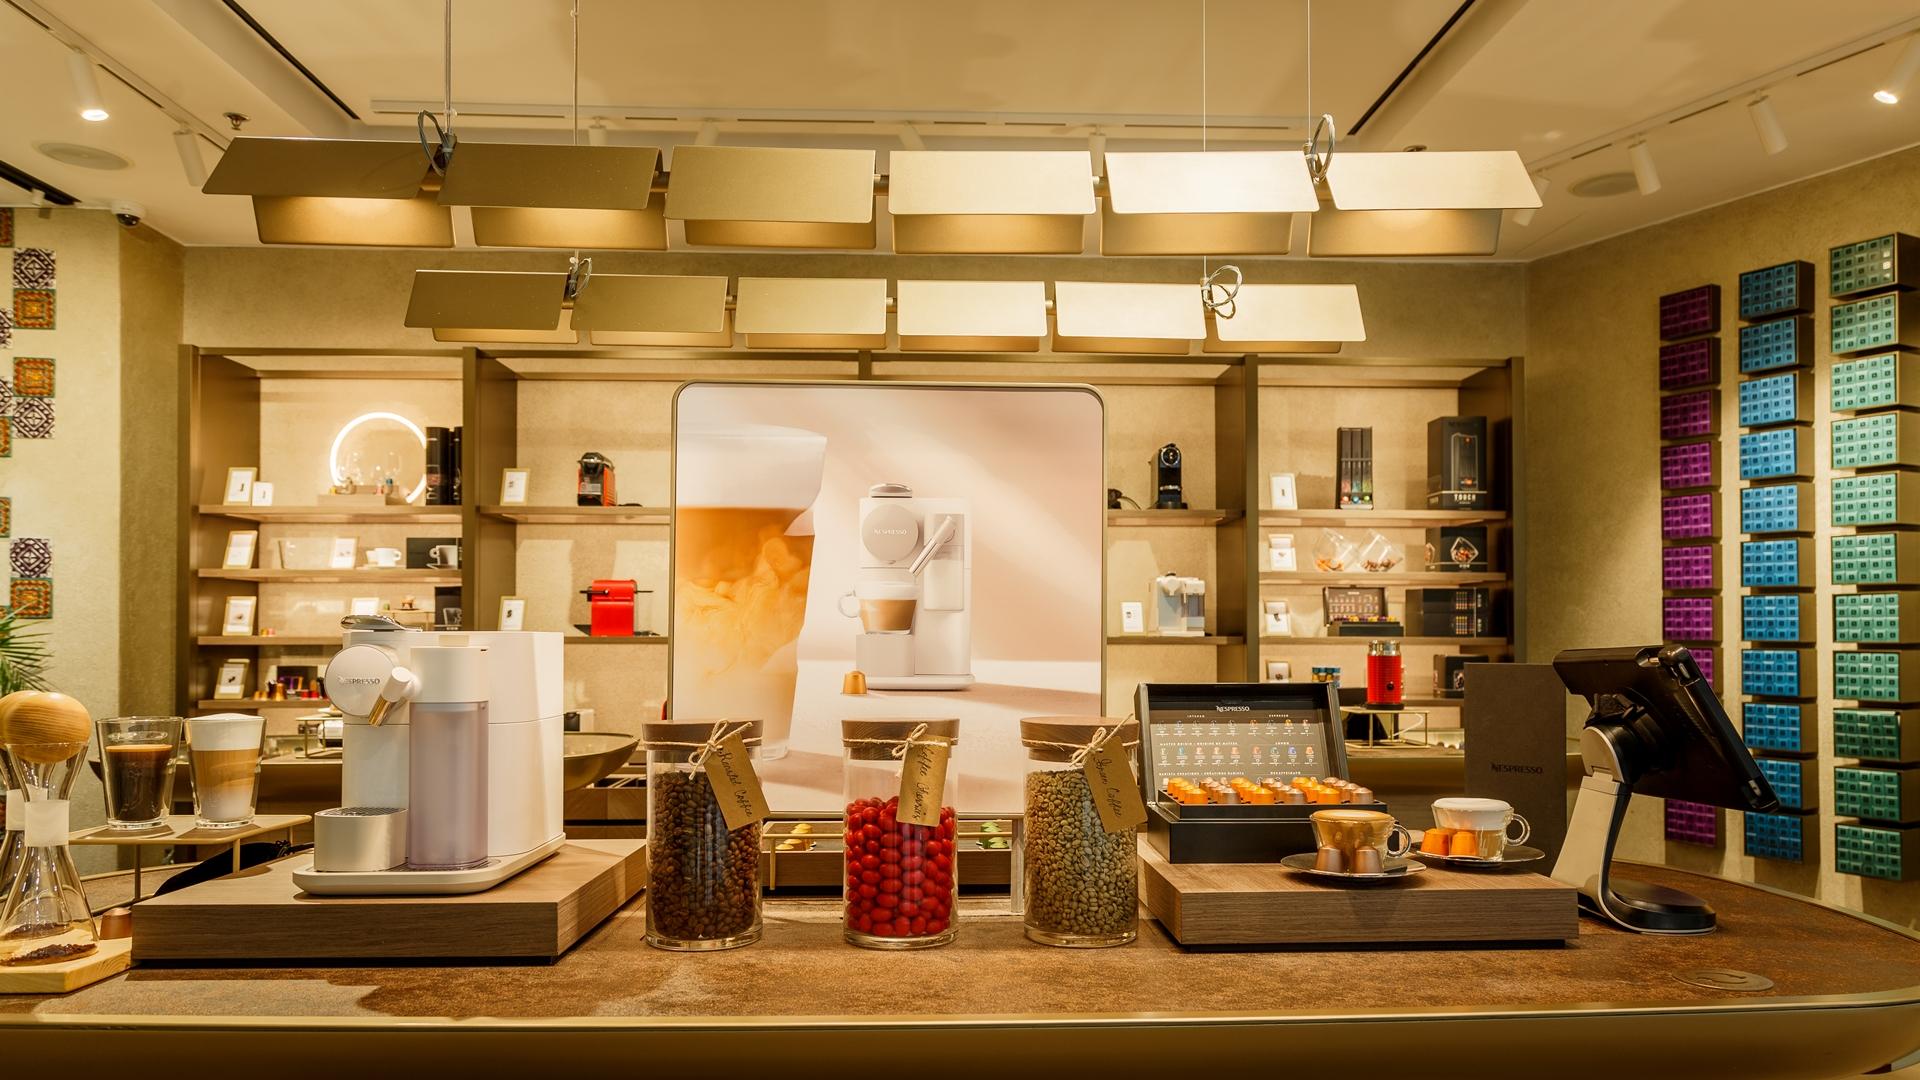 Nespresso Opens New Boutique Concept at The Podium